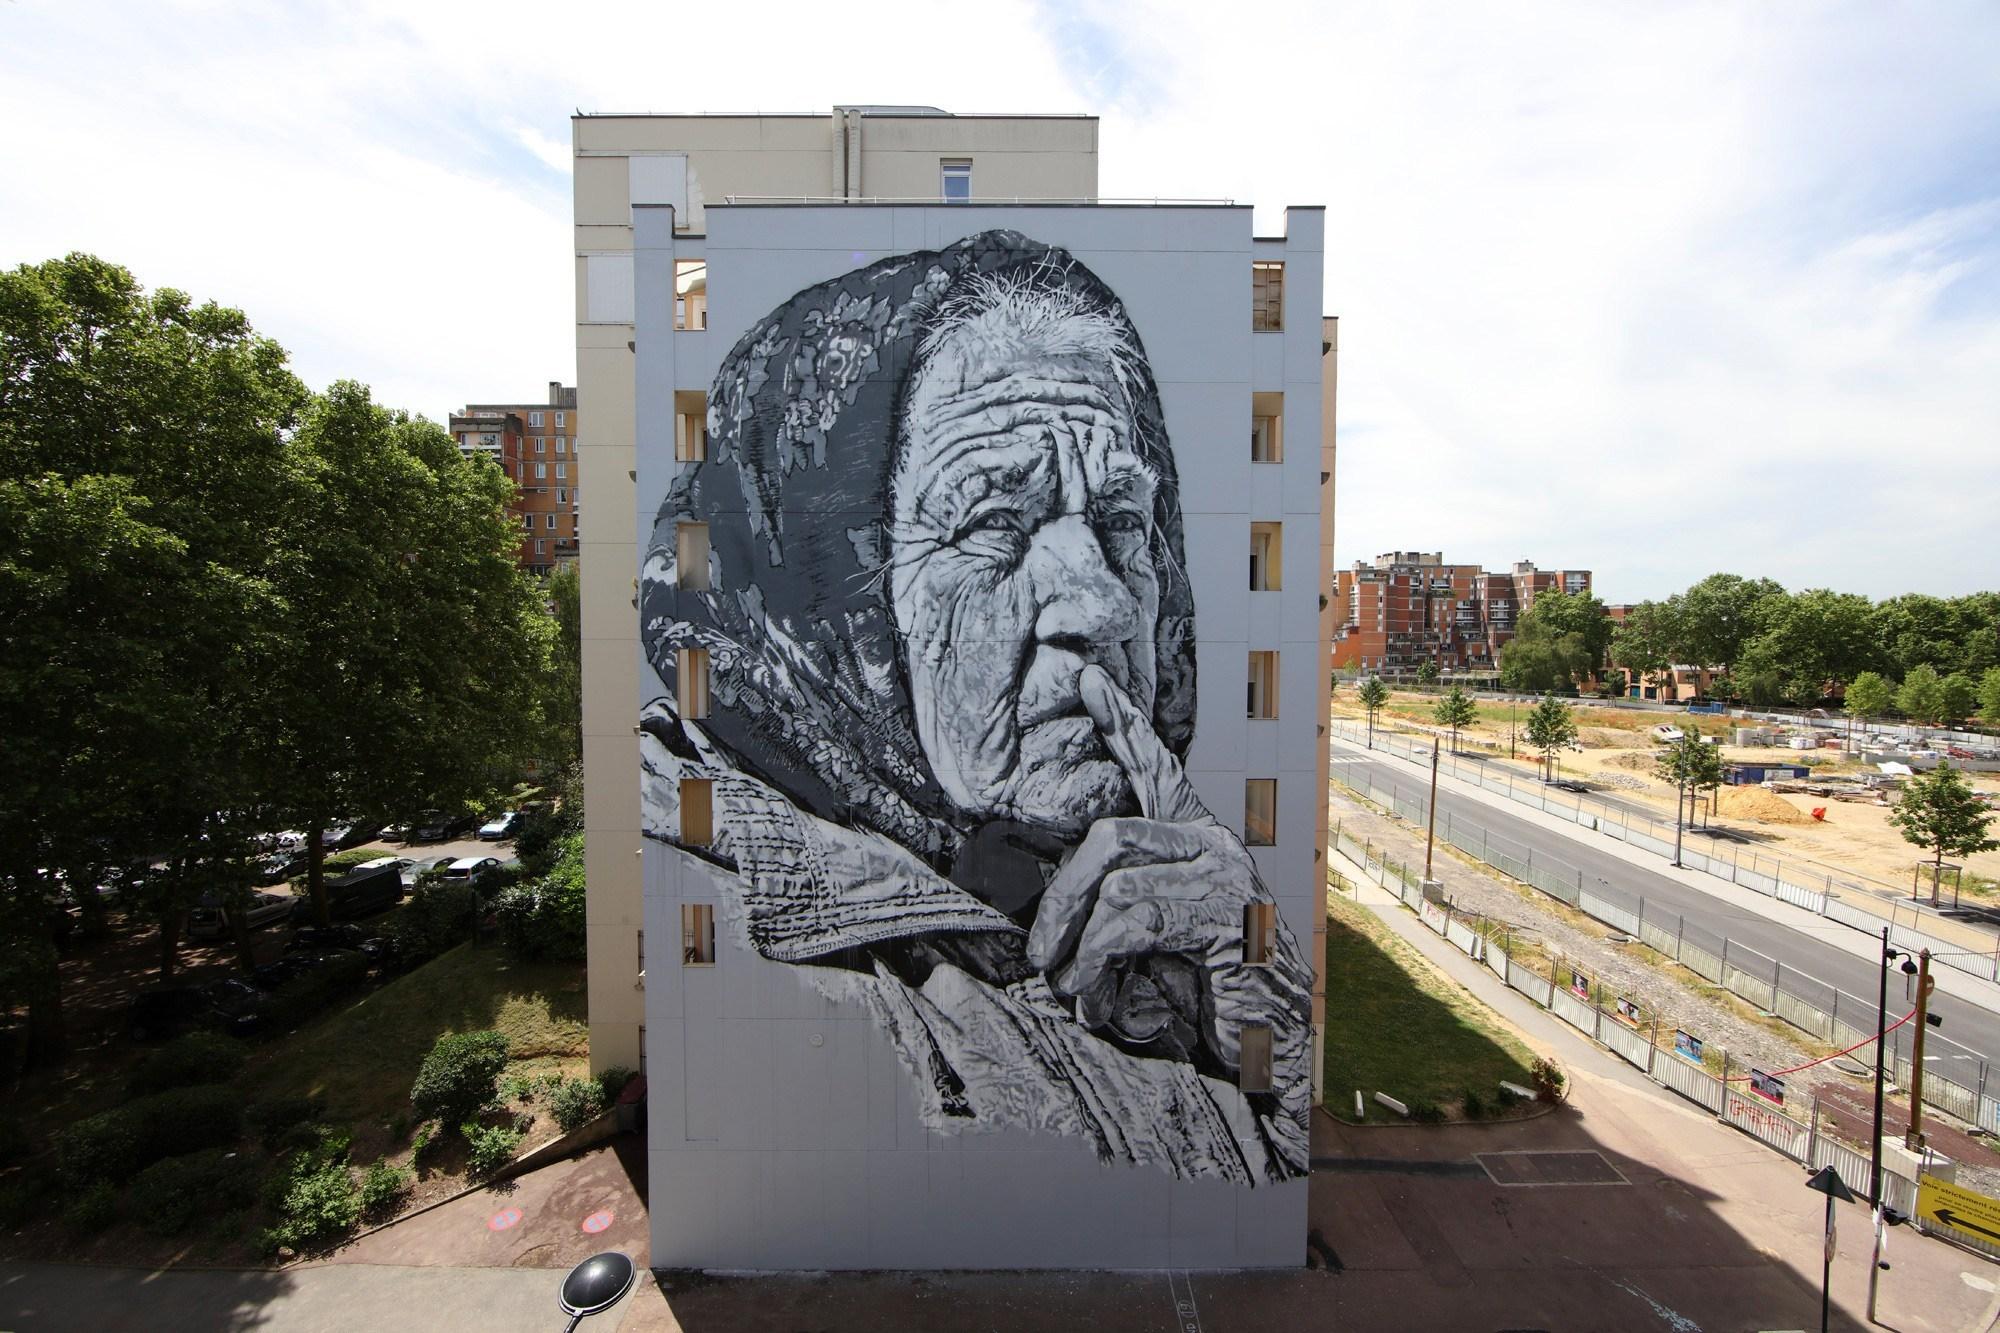 ecb-street-art-.jpg